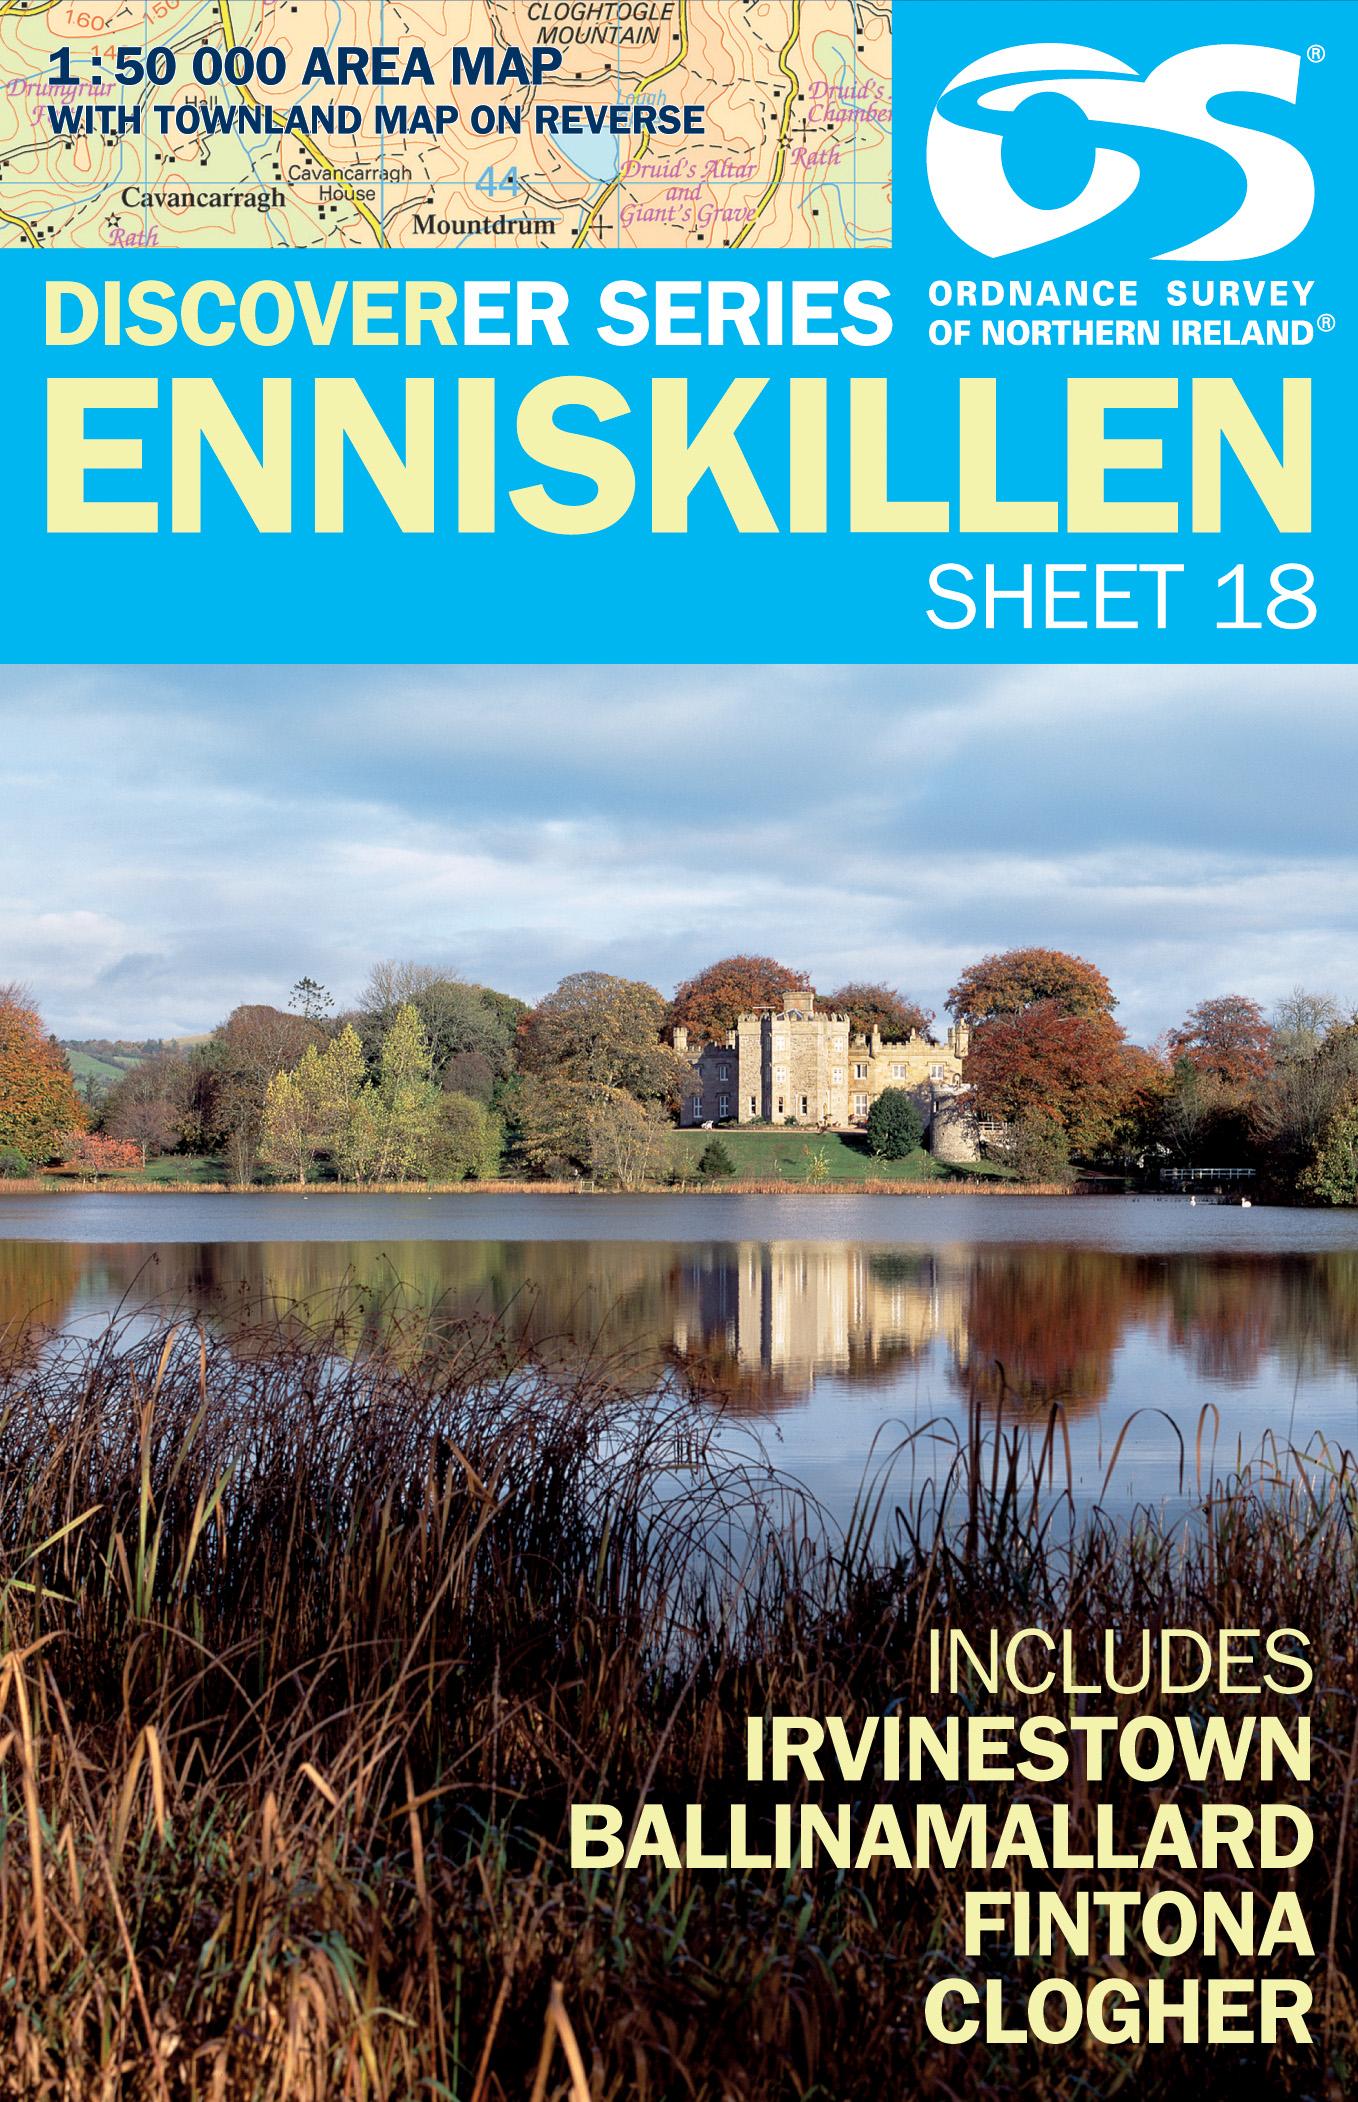 Wandelkaart 18 Discoverer Enniskillen | Ordnance Survey Northern Ireland